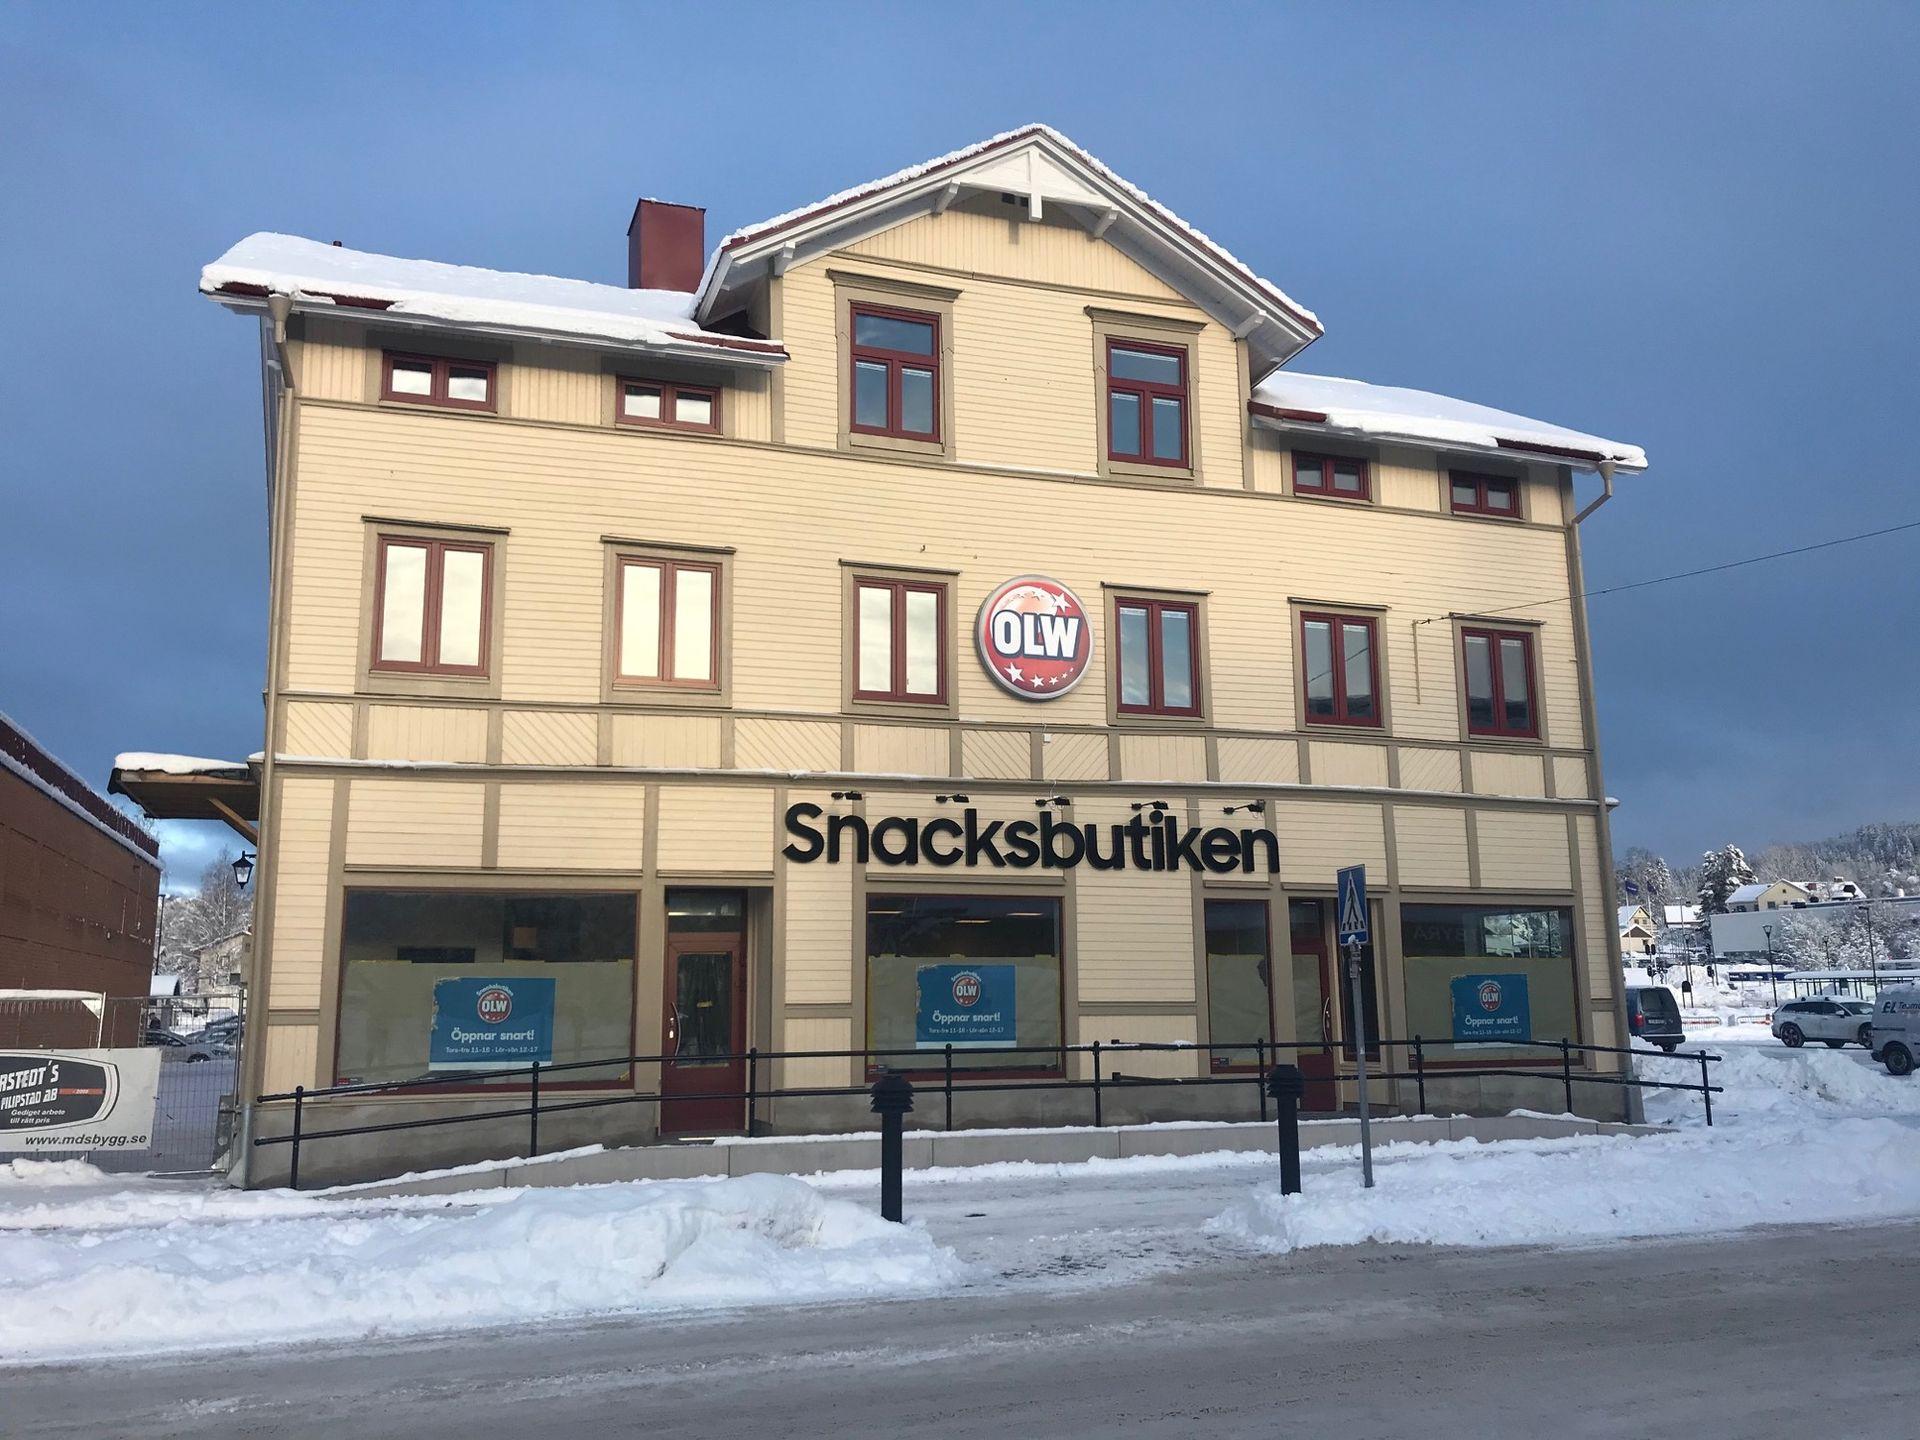 OLW öppnar snacksbutik